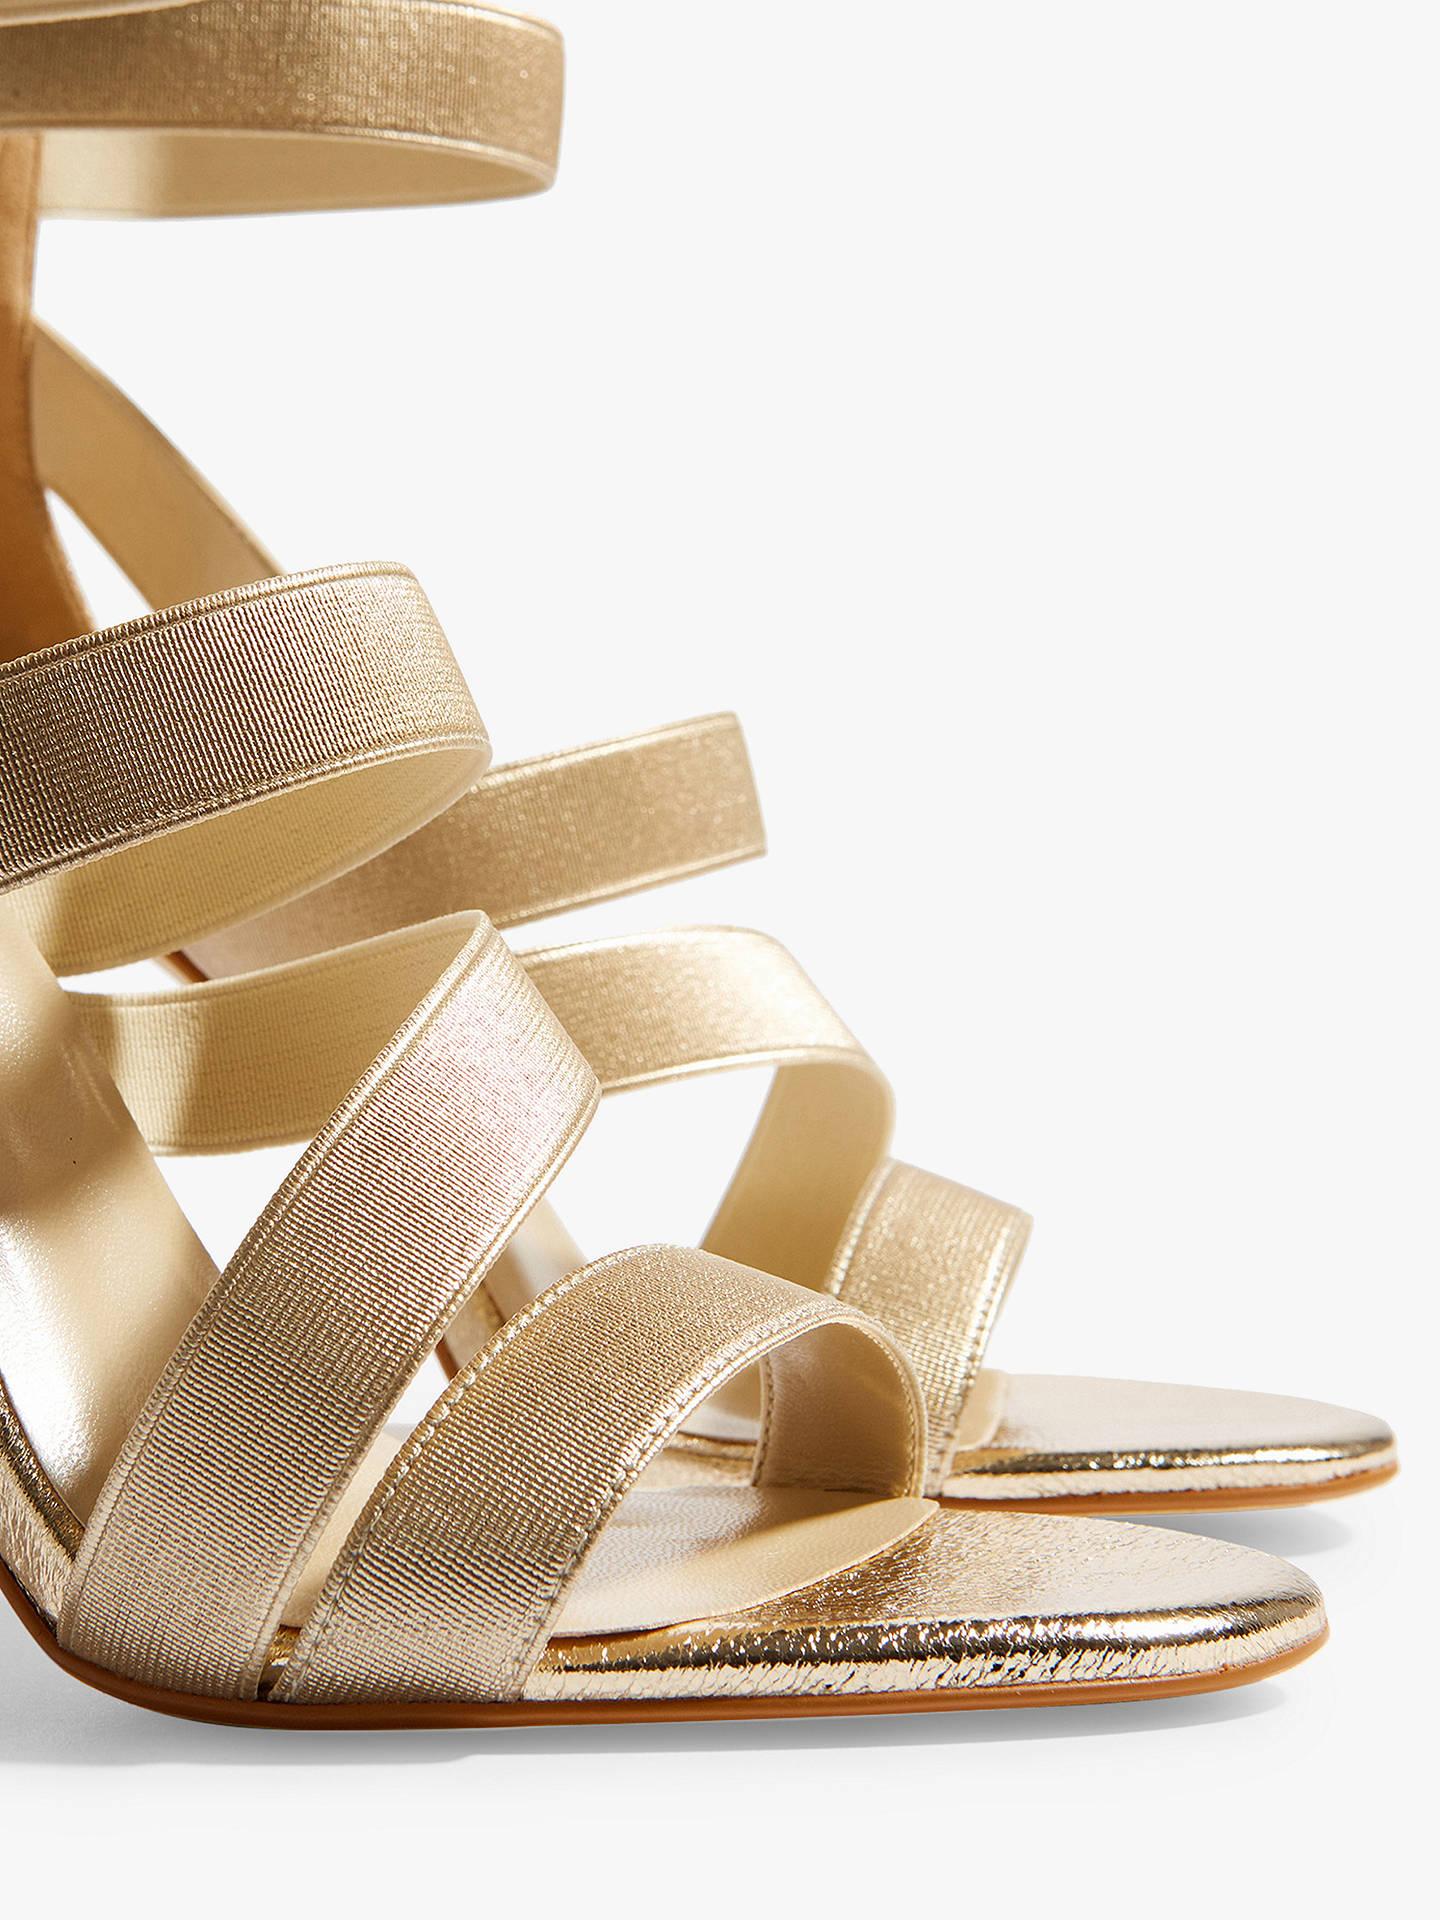 328de1767e ... Buy Karen Millen Glitter Metallic Strap Sandals, Gold, 7 Online at  johnlewis.com